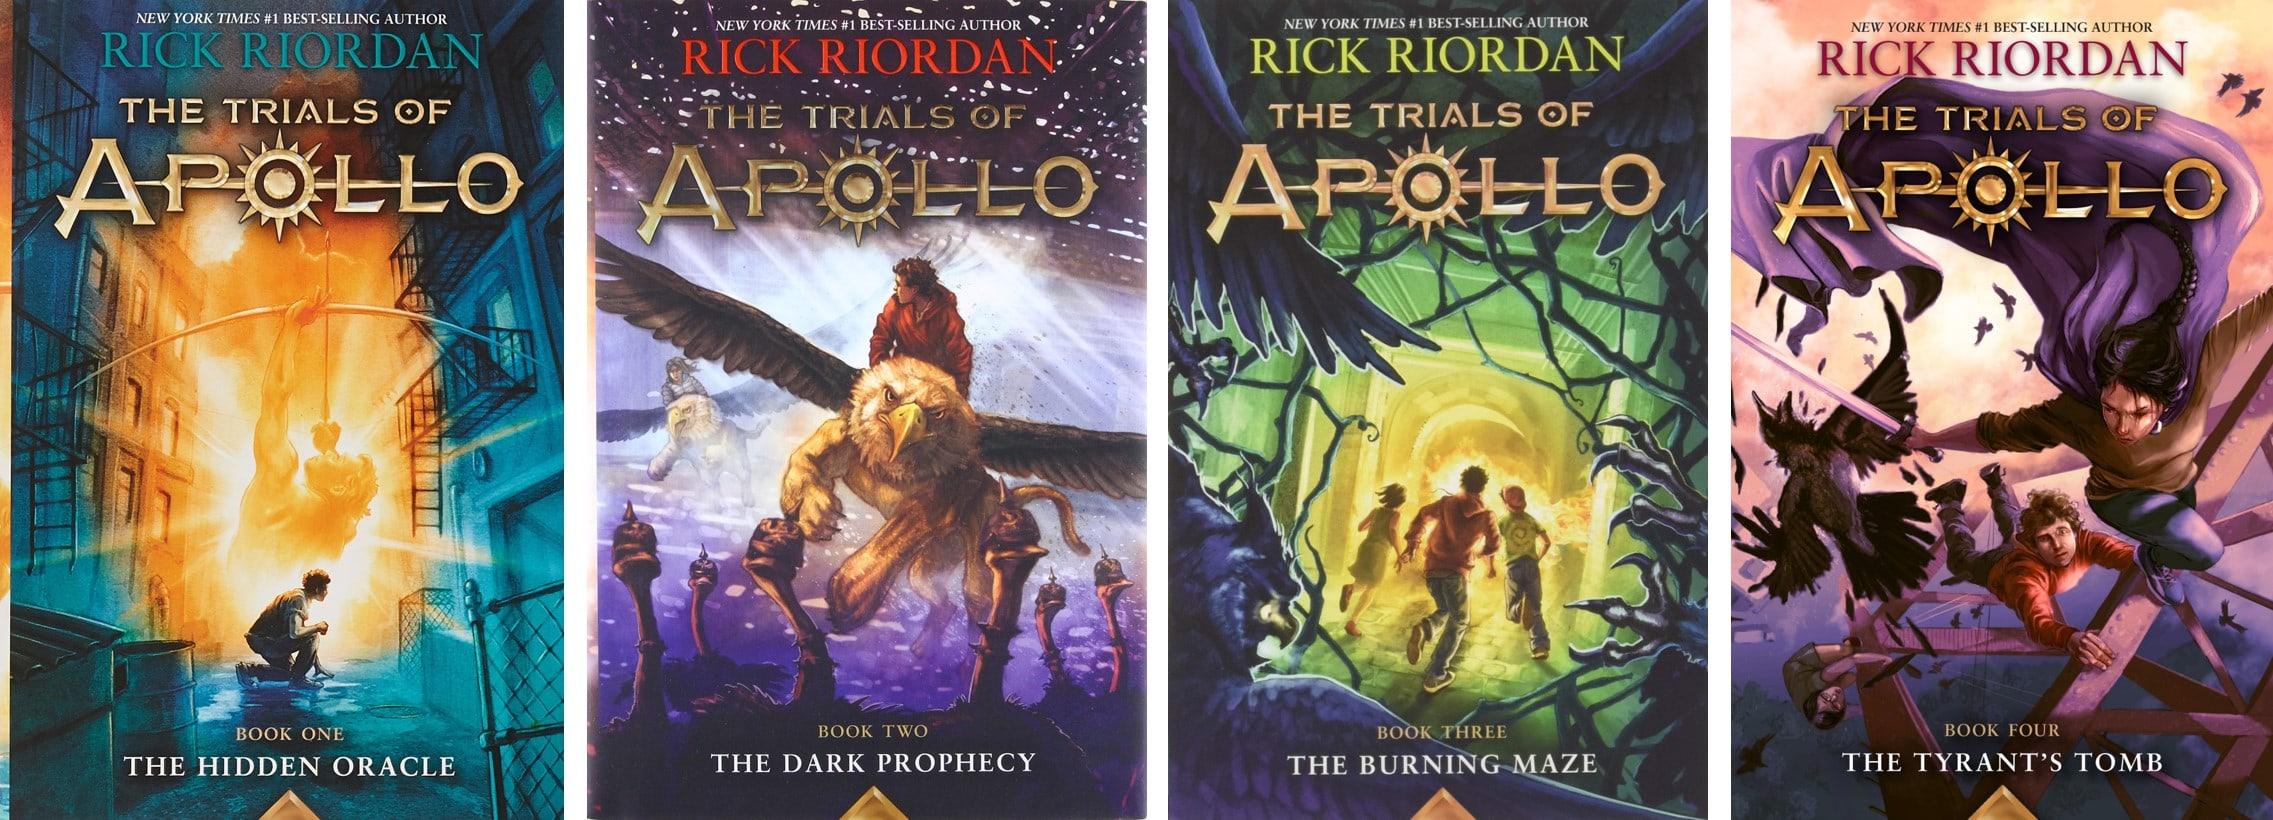 The Trials of Apollo Series